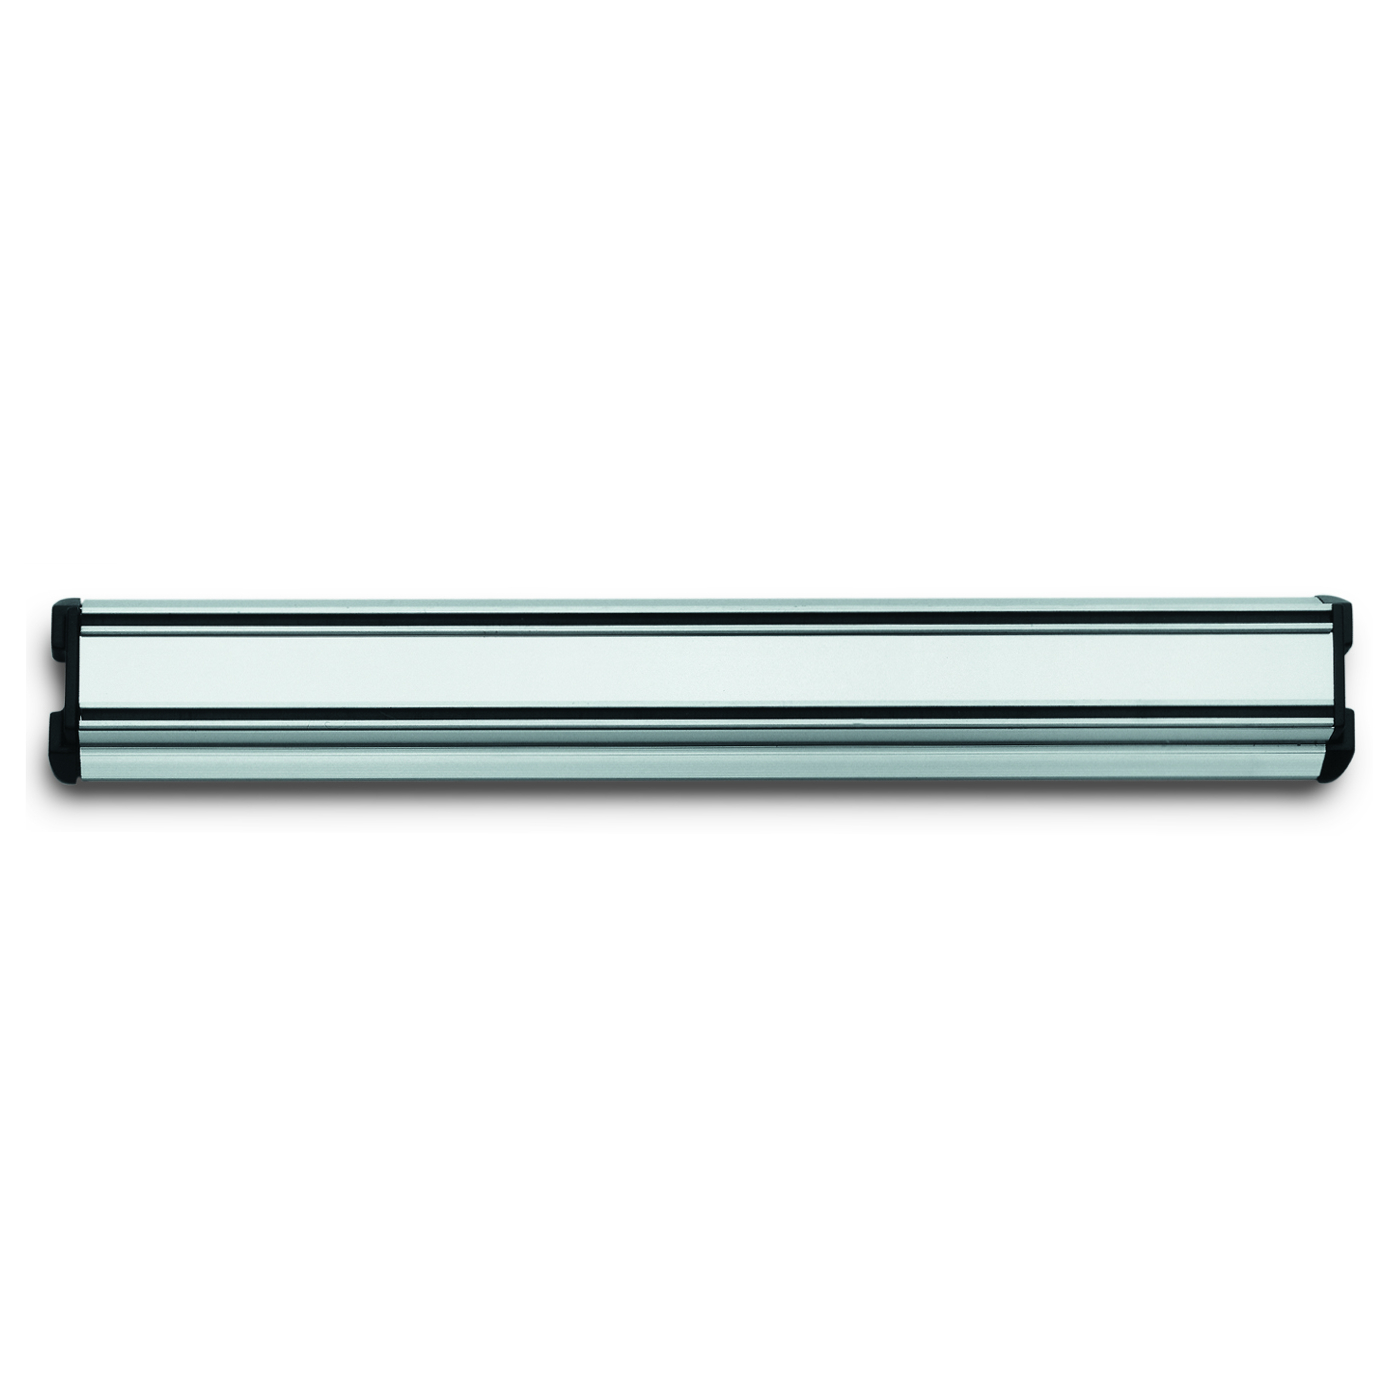 Wusthof Chrome-Plated 12 Inch Magnabar Knife Storage Strip